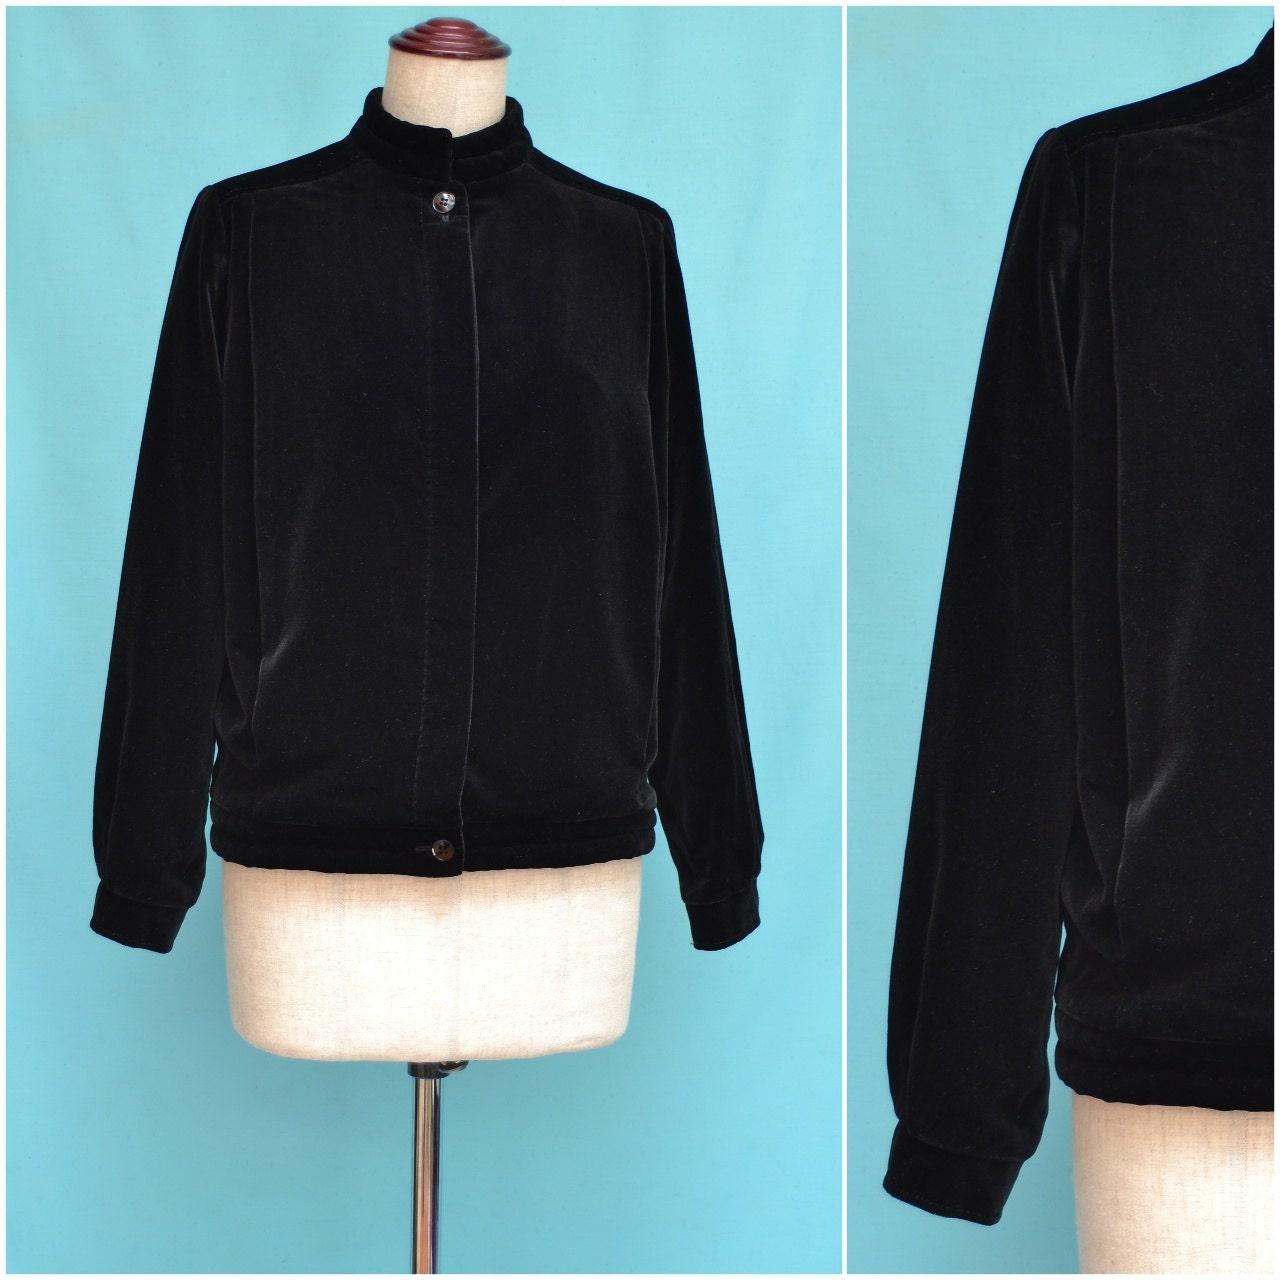 Vintage veste blazer de style ann es 80 noir velours - Veste annee 80 ...